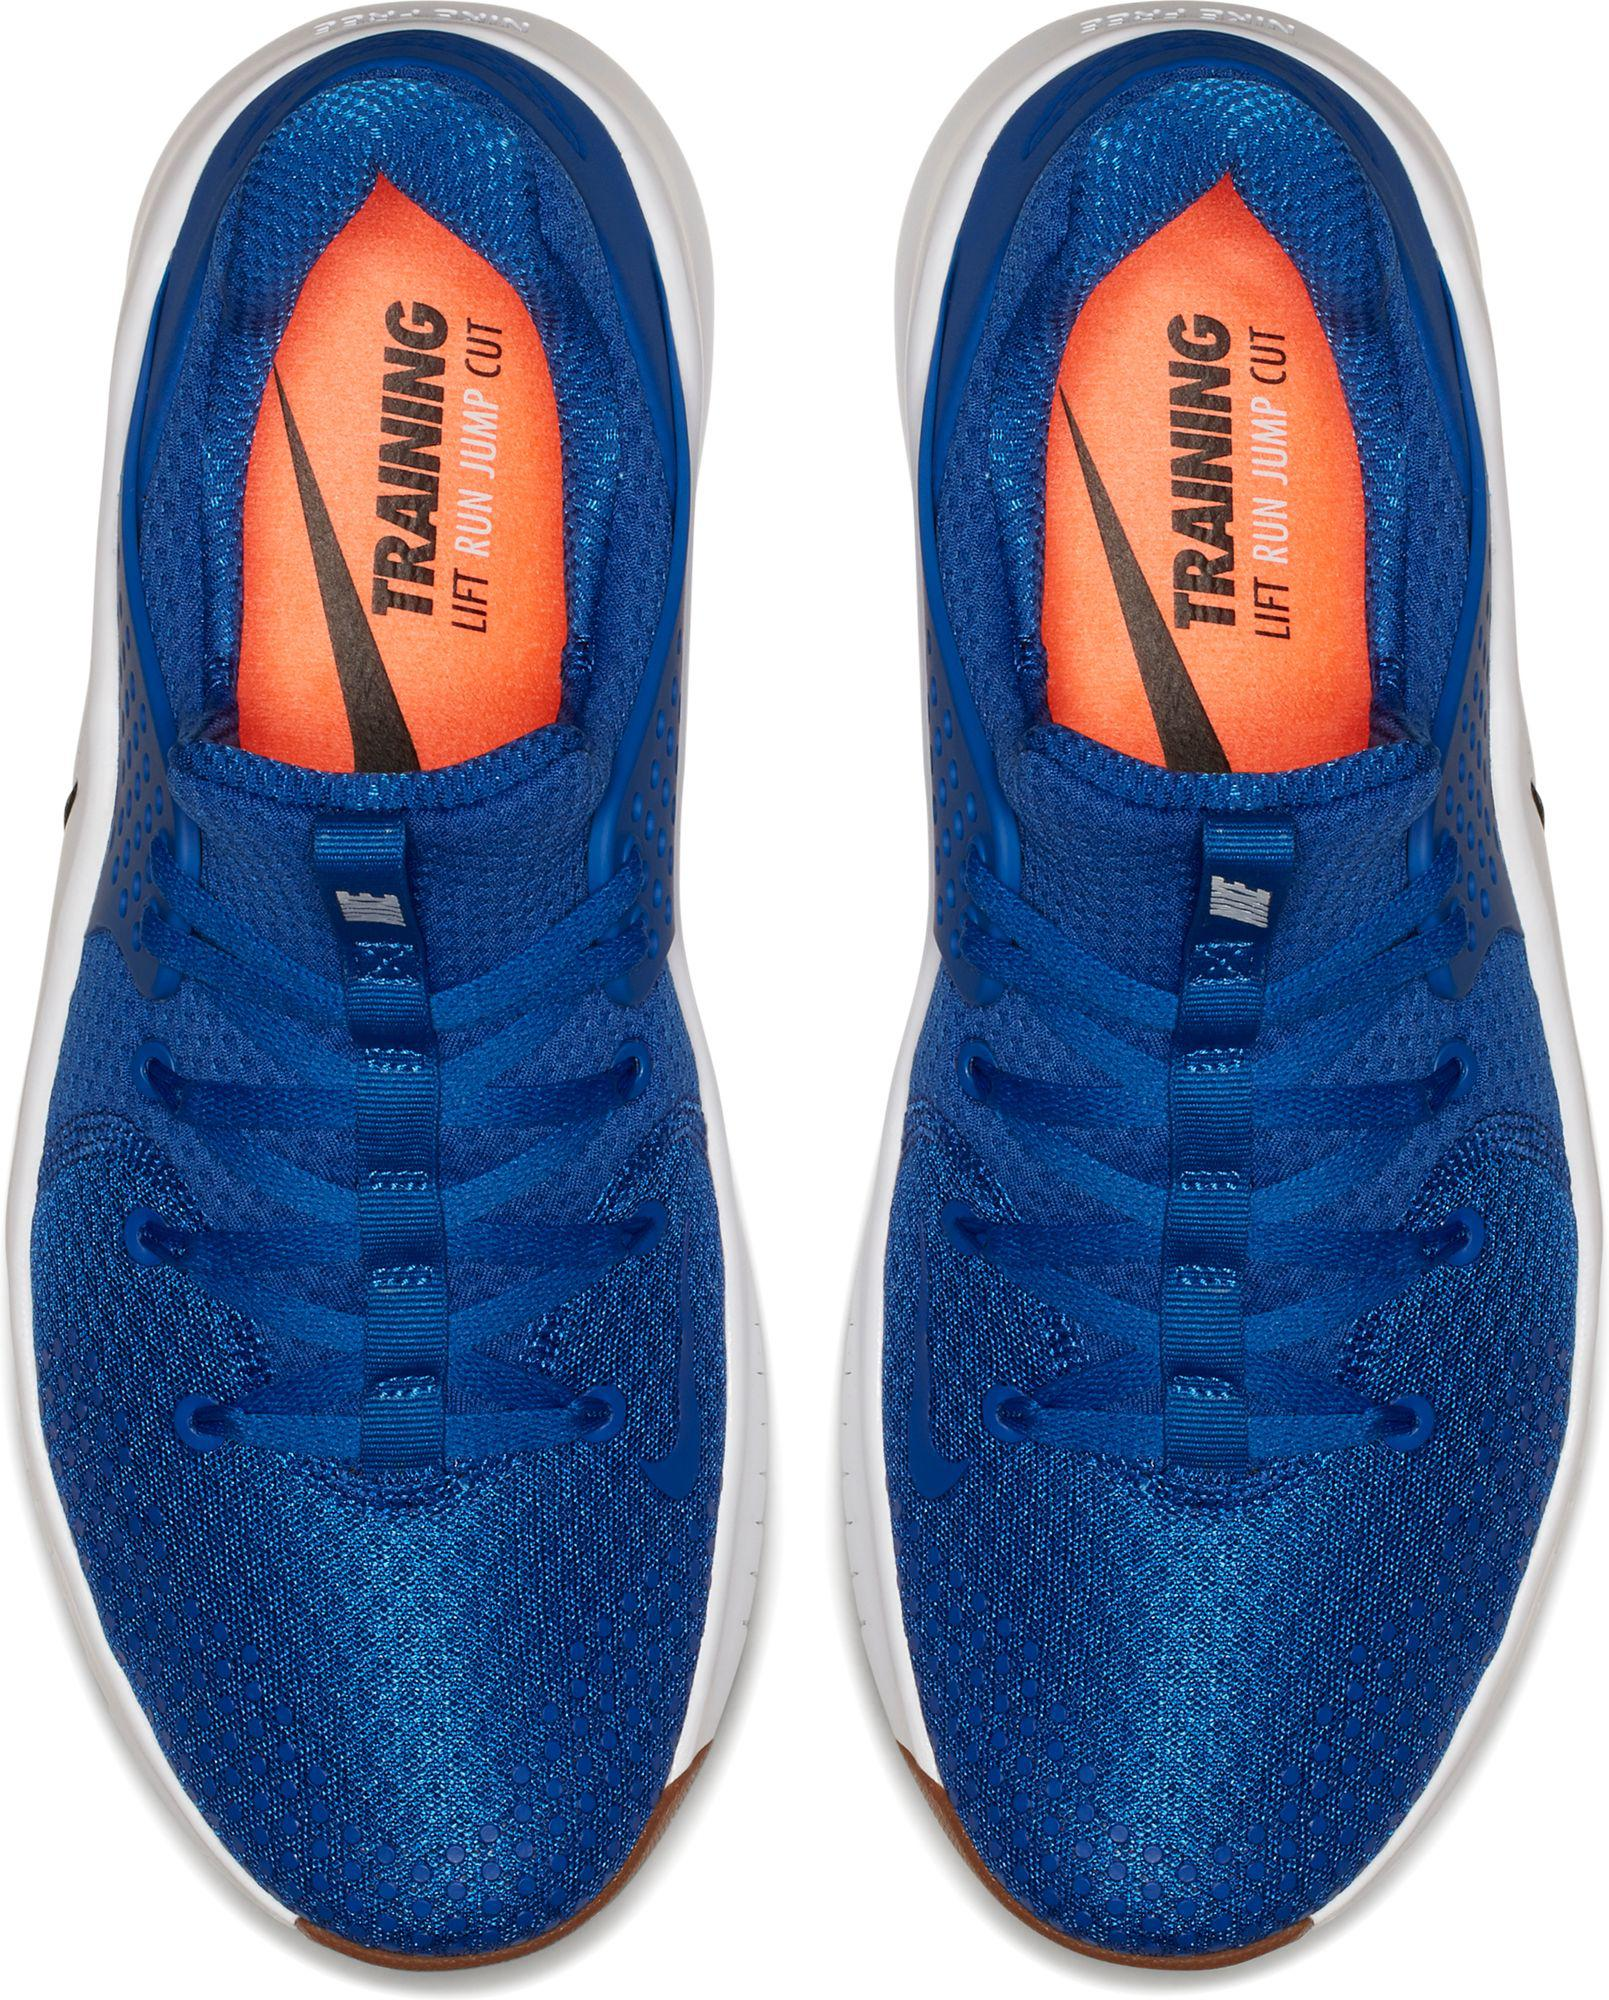 factory authentic 5269a 61a71 Men's Blue Free Tr8 Training Shoes